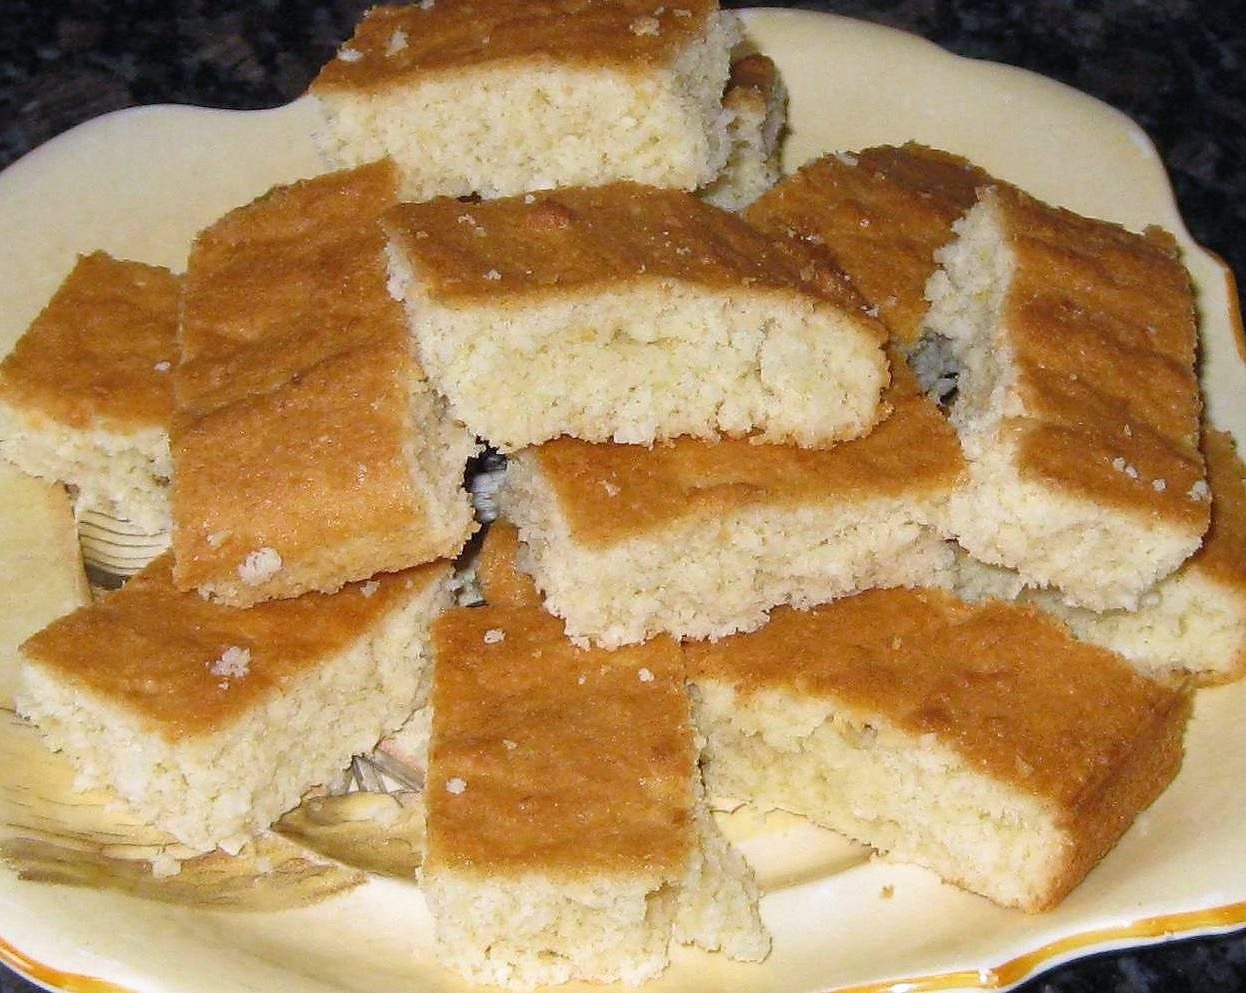 B Nh Butter Cake